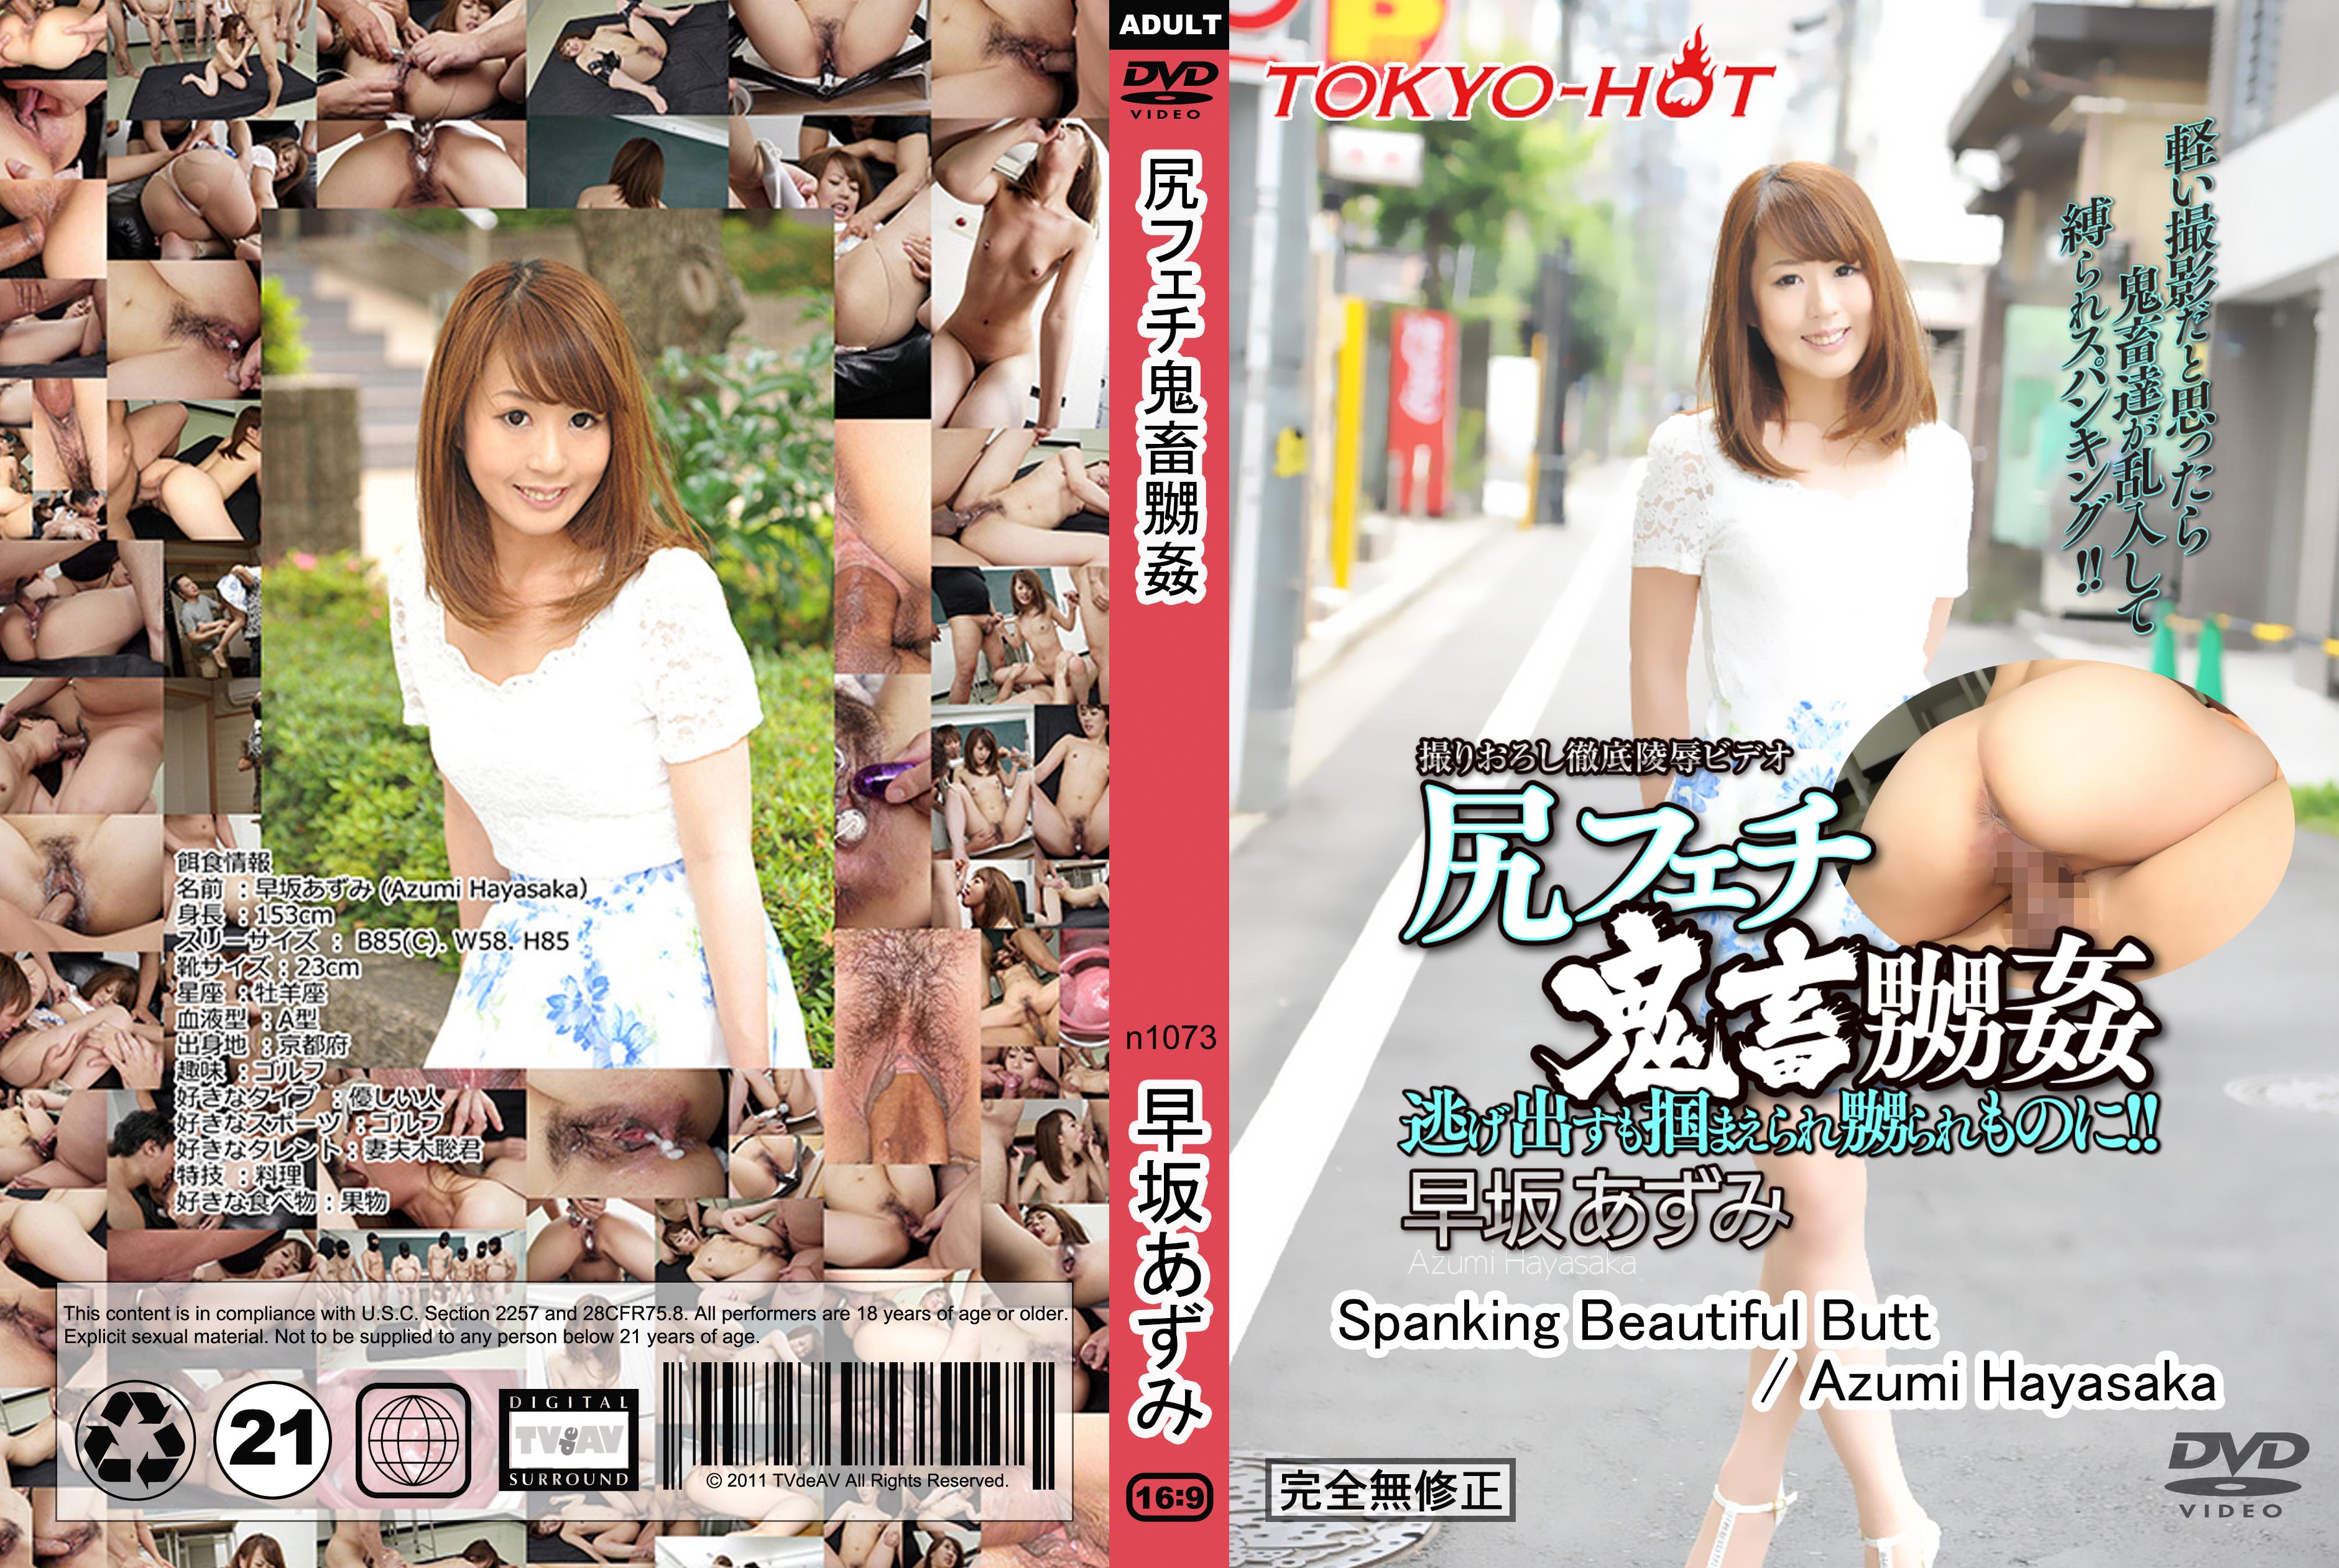 tokyo-hot-n1073-尻フェチ鬼畜嬲カン